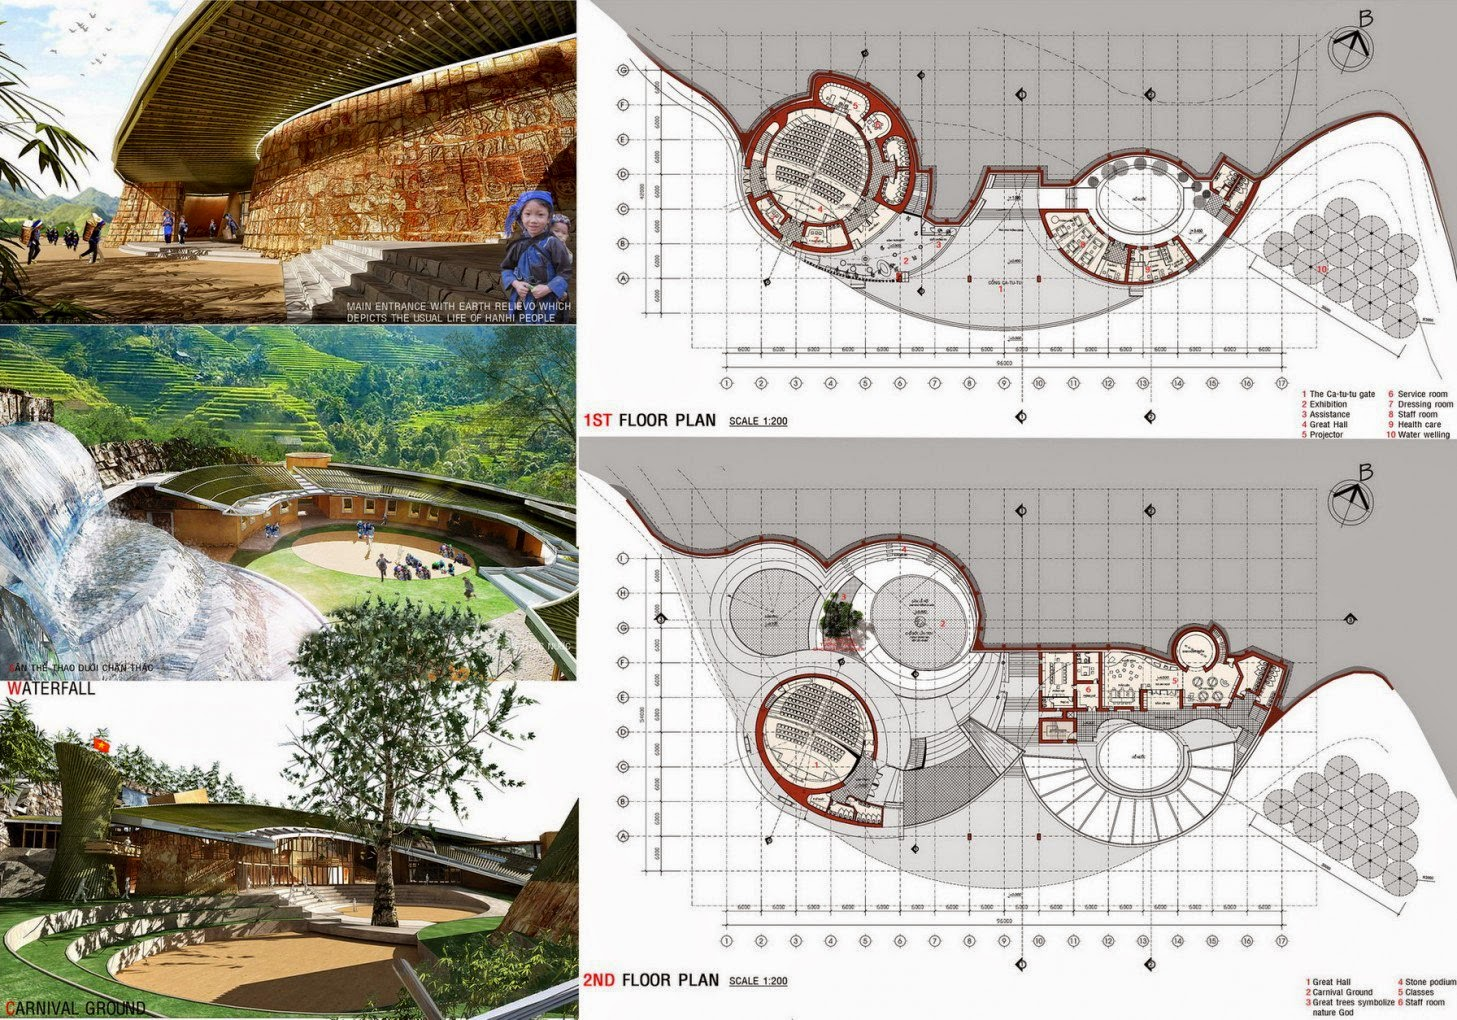 sinh viên kiến trúc tiêu biểu